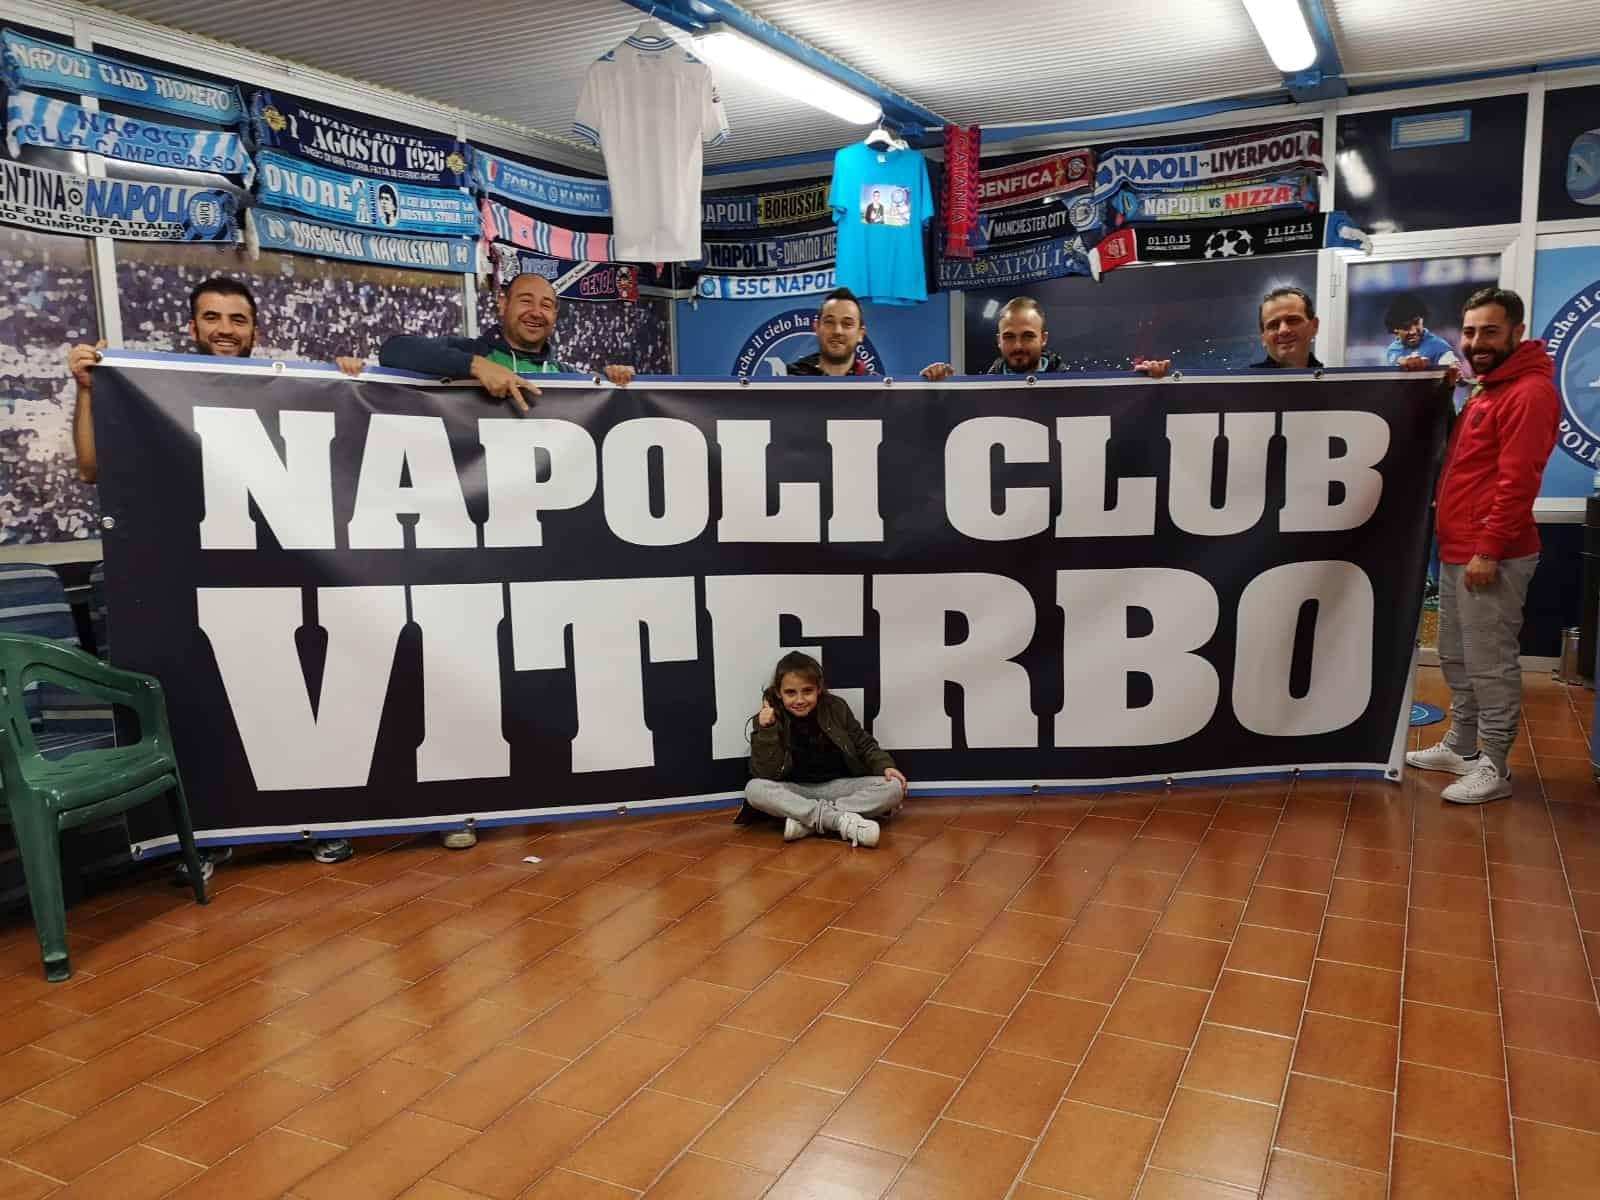 Napoli Club Viterbo